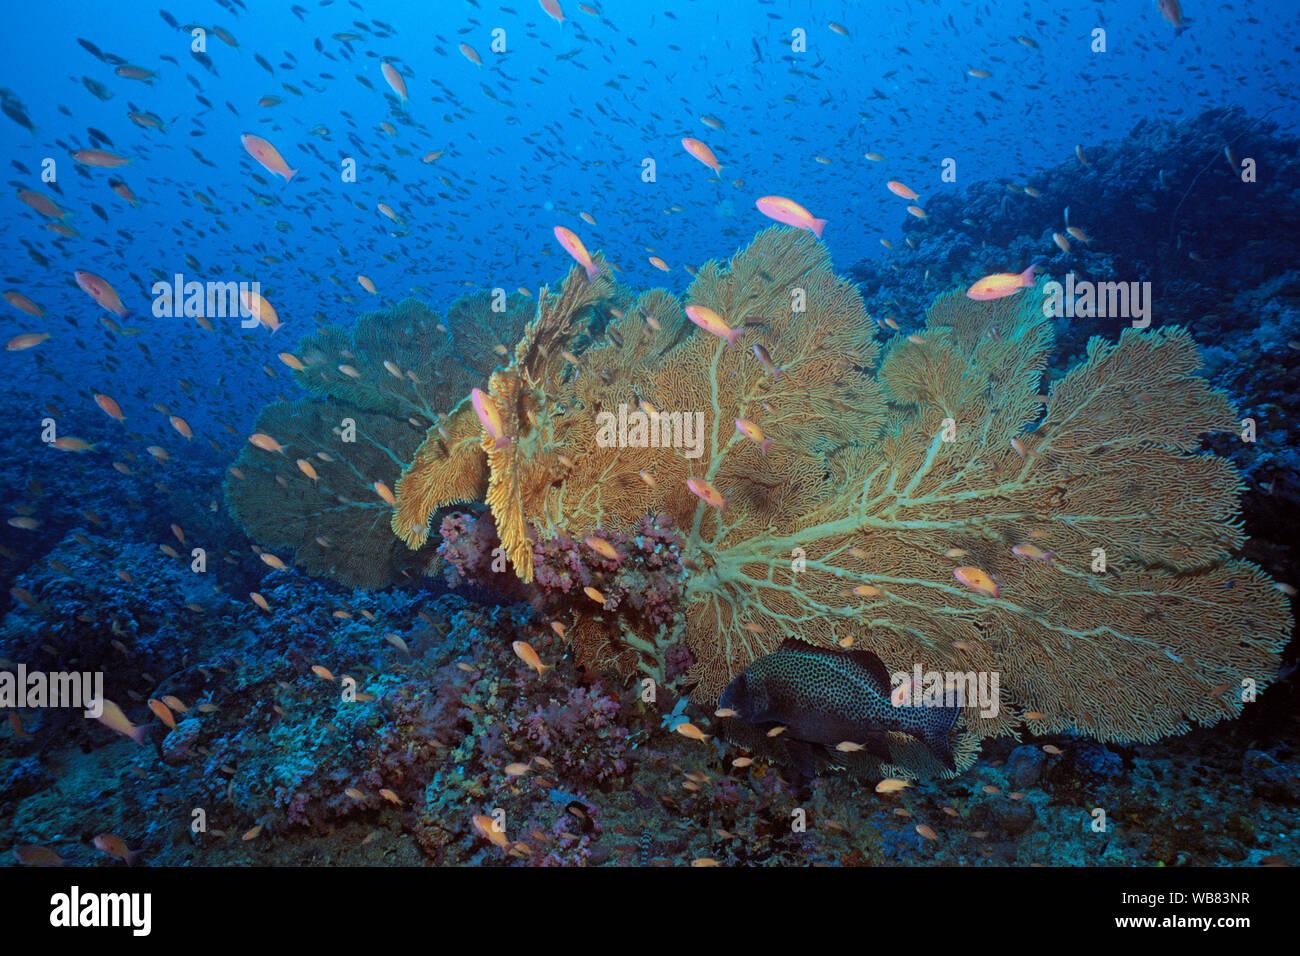 Sea goldies or Lyretail anthias (Pseudanthias squamipinnis) cruising at a Hickson's Fan Coral (Annella mollis), Negros, Visayas, Philippines Stock Photo